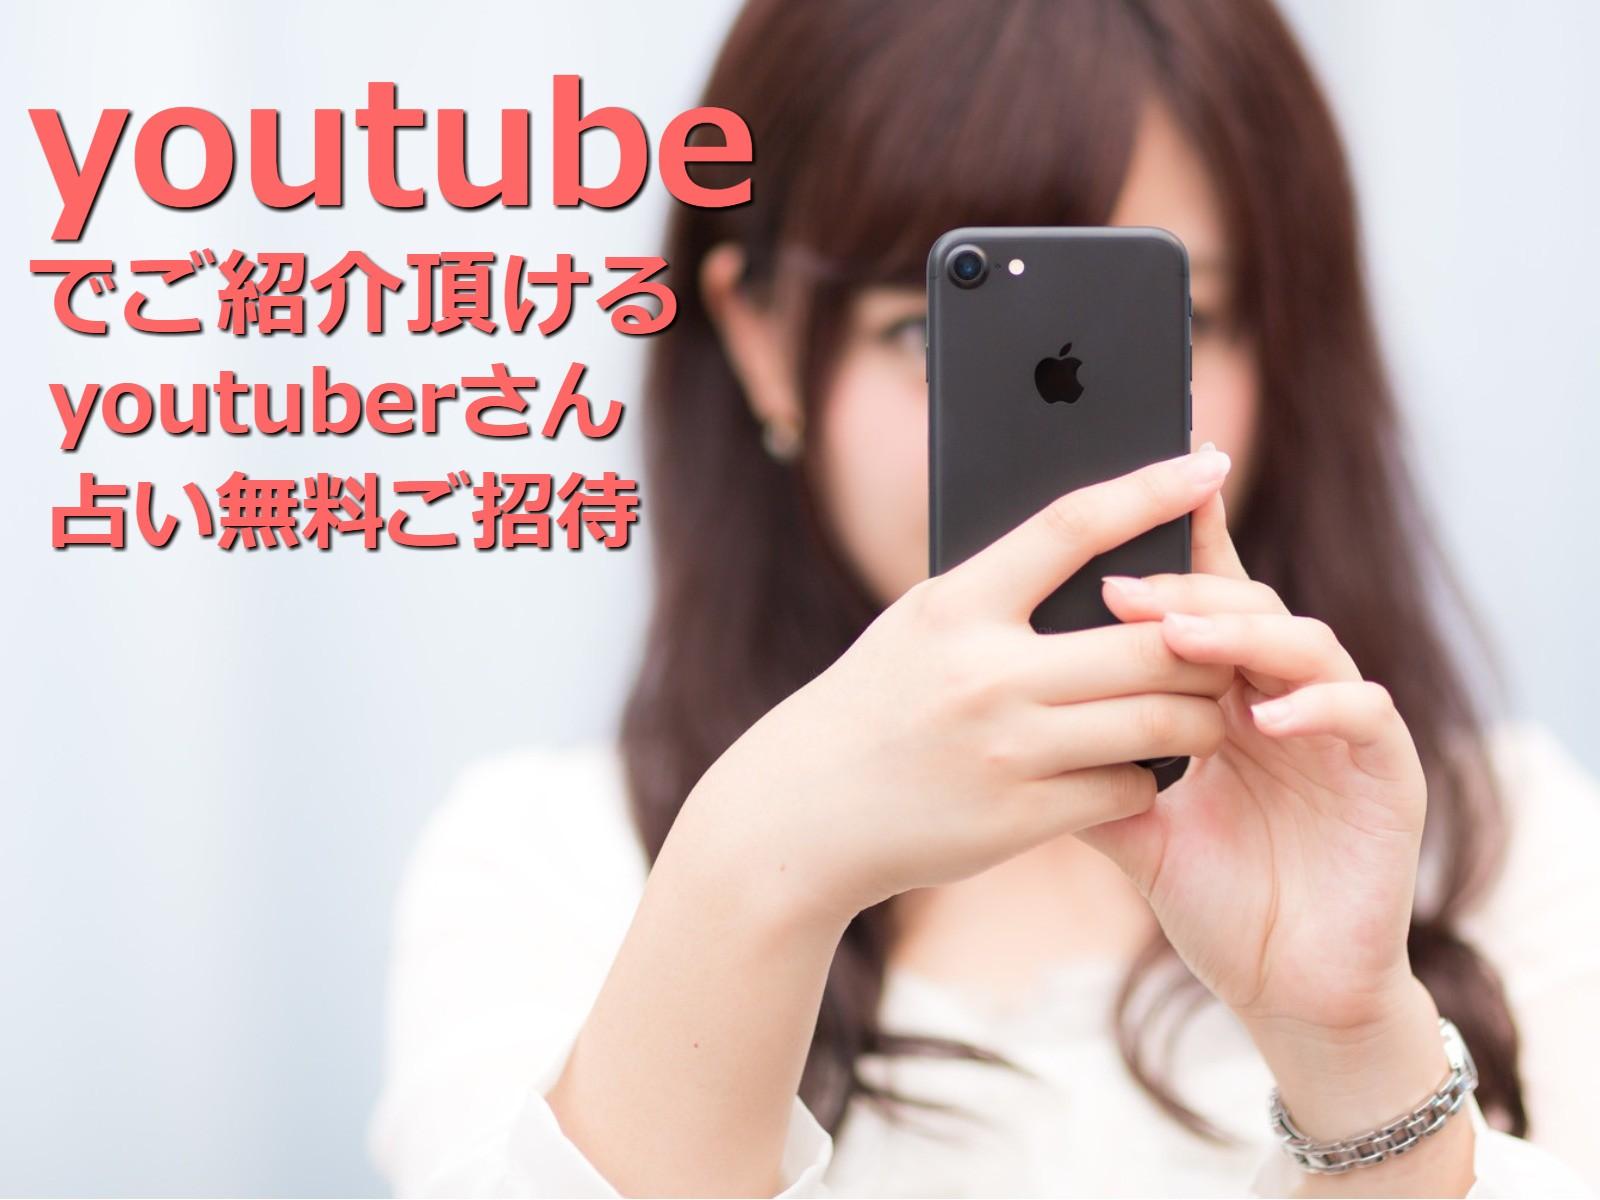 youtuber(自称も可)で占いコンテンツを活用した動画企画をした方へ!【個室占い15分無料モニター】として年2回ご招待させて頂きます。